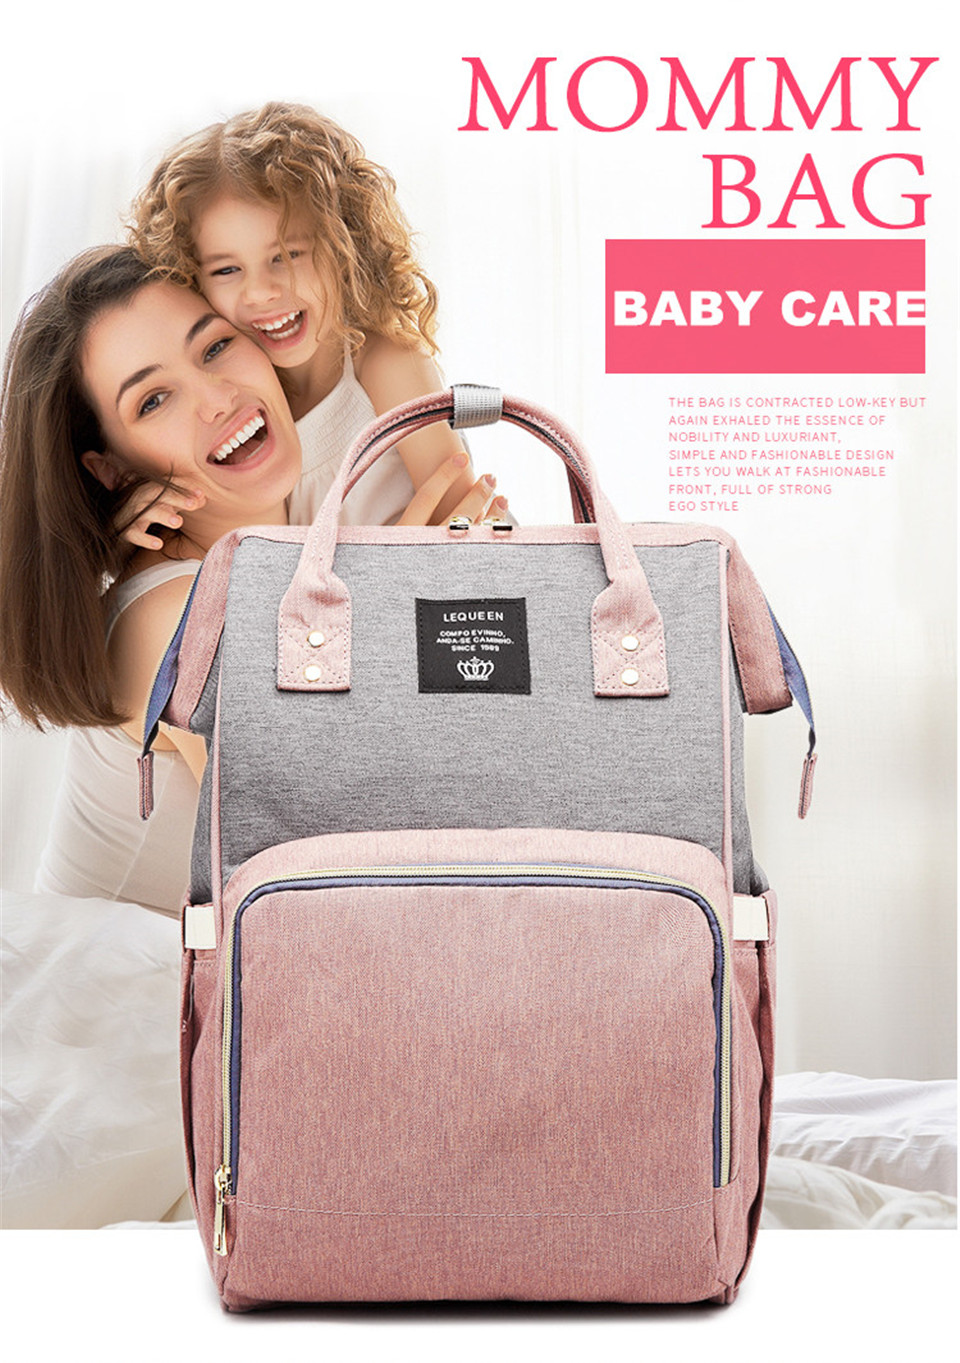 Nappy-Backpack-Bag-Mummy-Waterproof-Outdoor-Travel-Diaper-Bags-Online-Shop-1